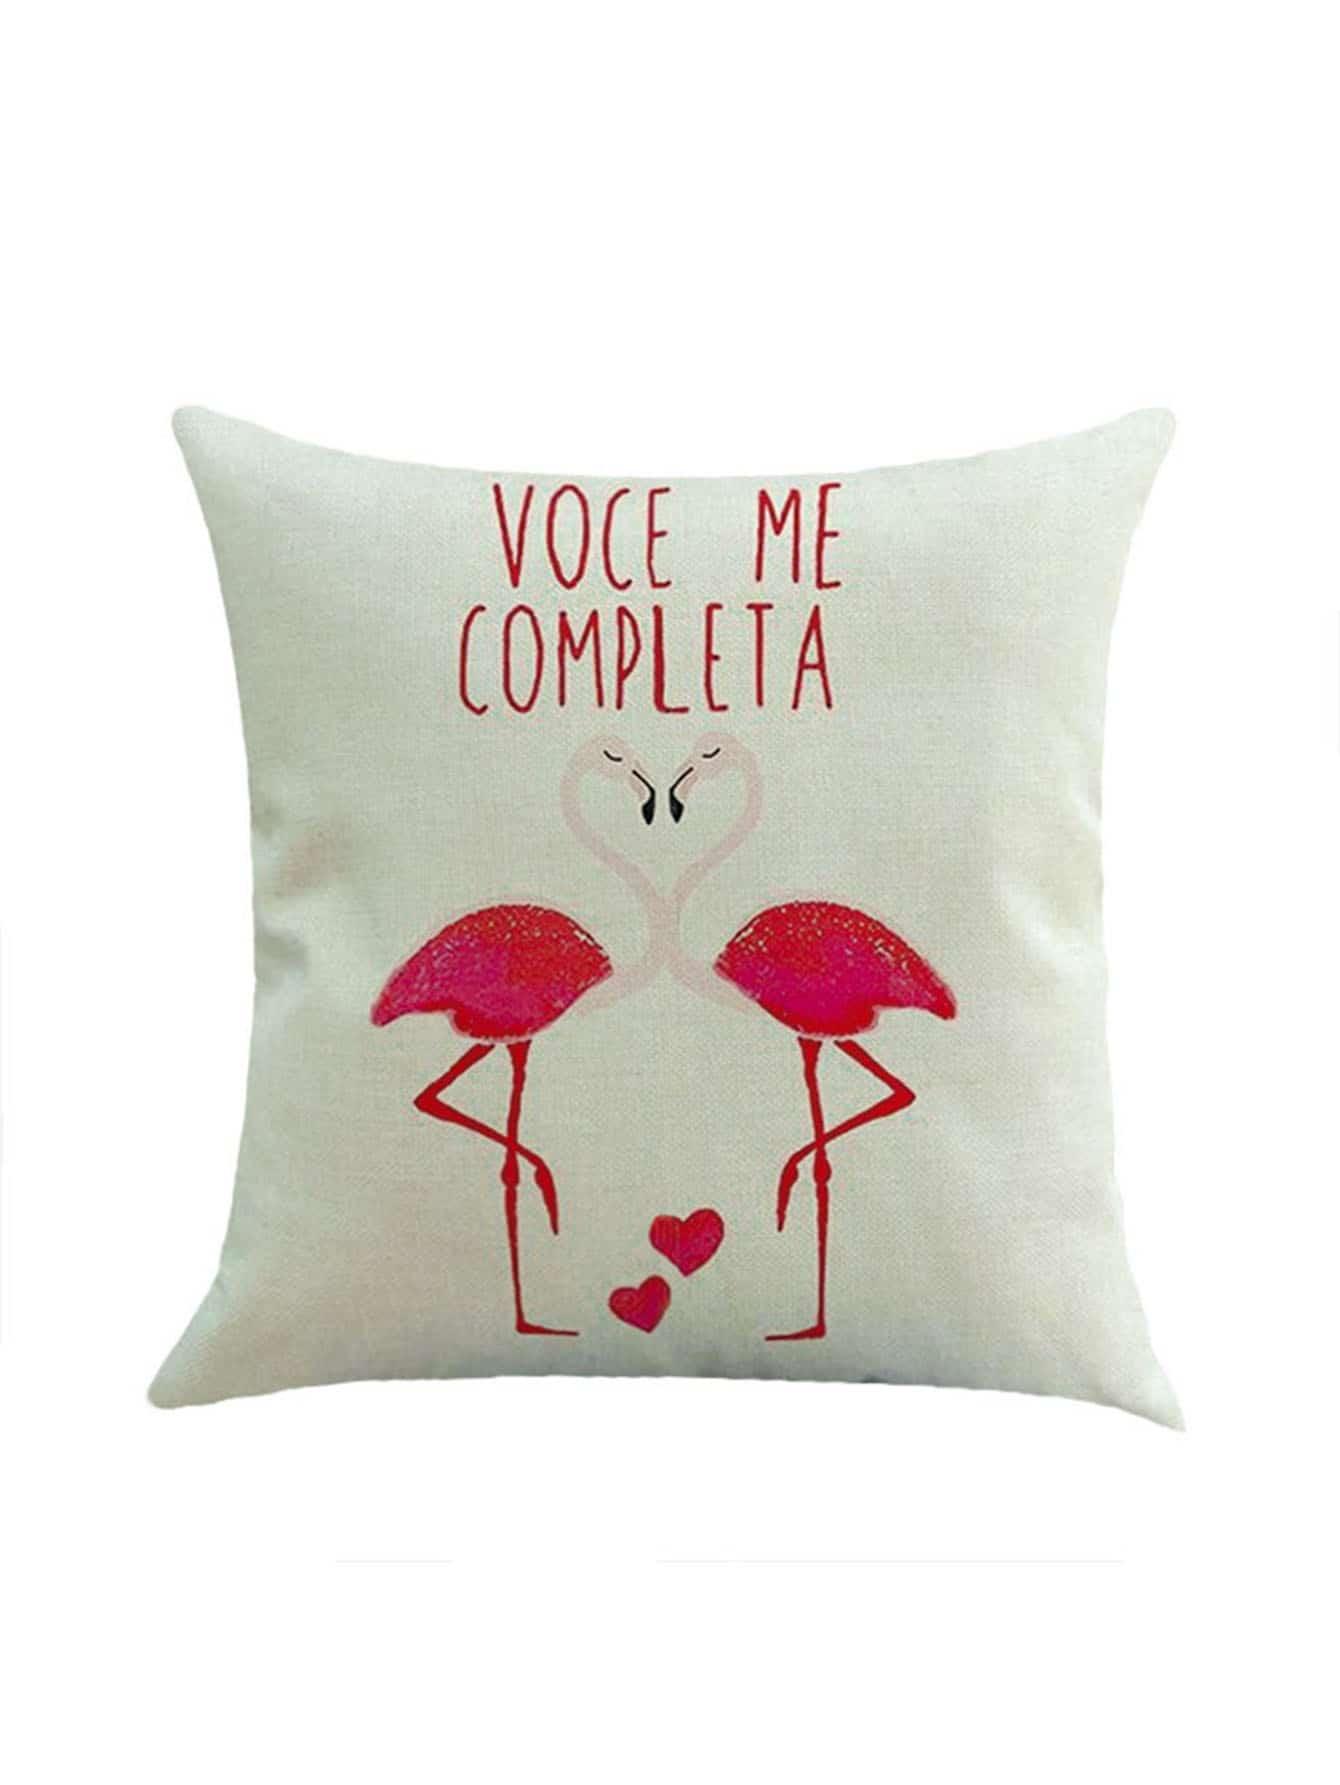 Couple Flamingo Print Pillowcase Cover